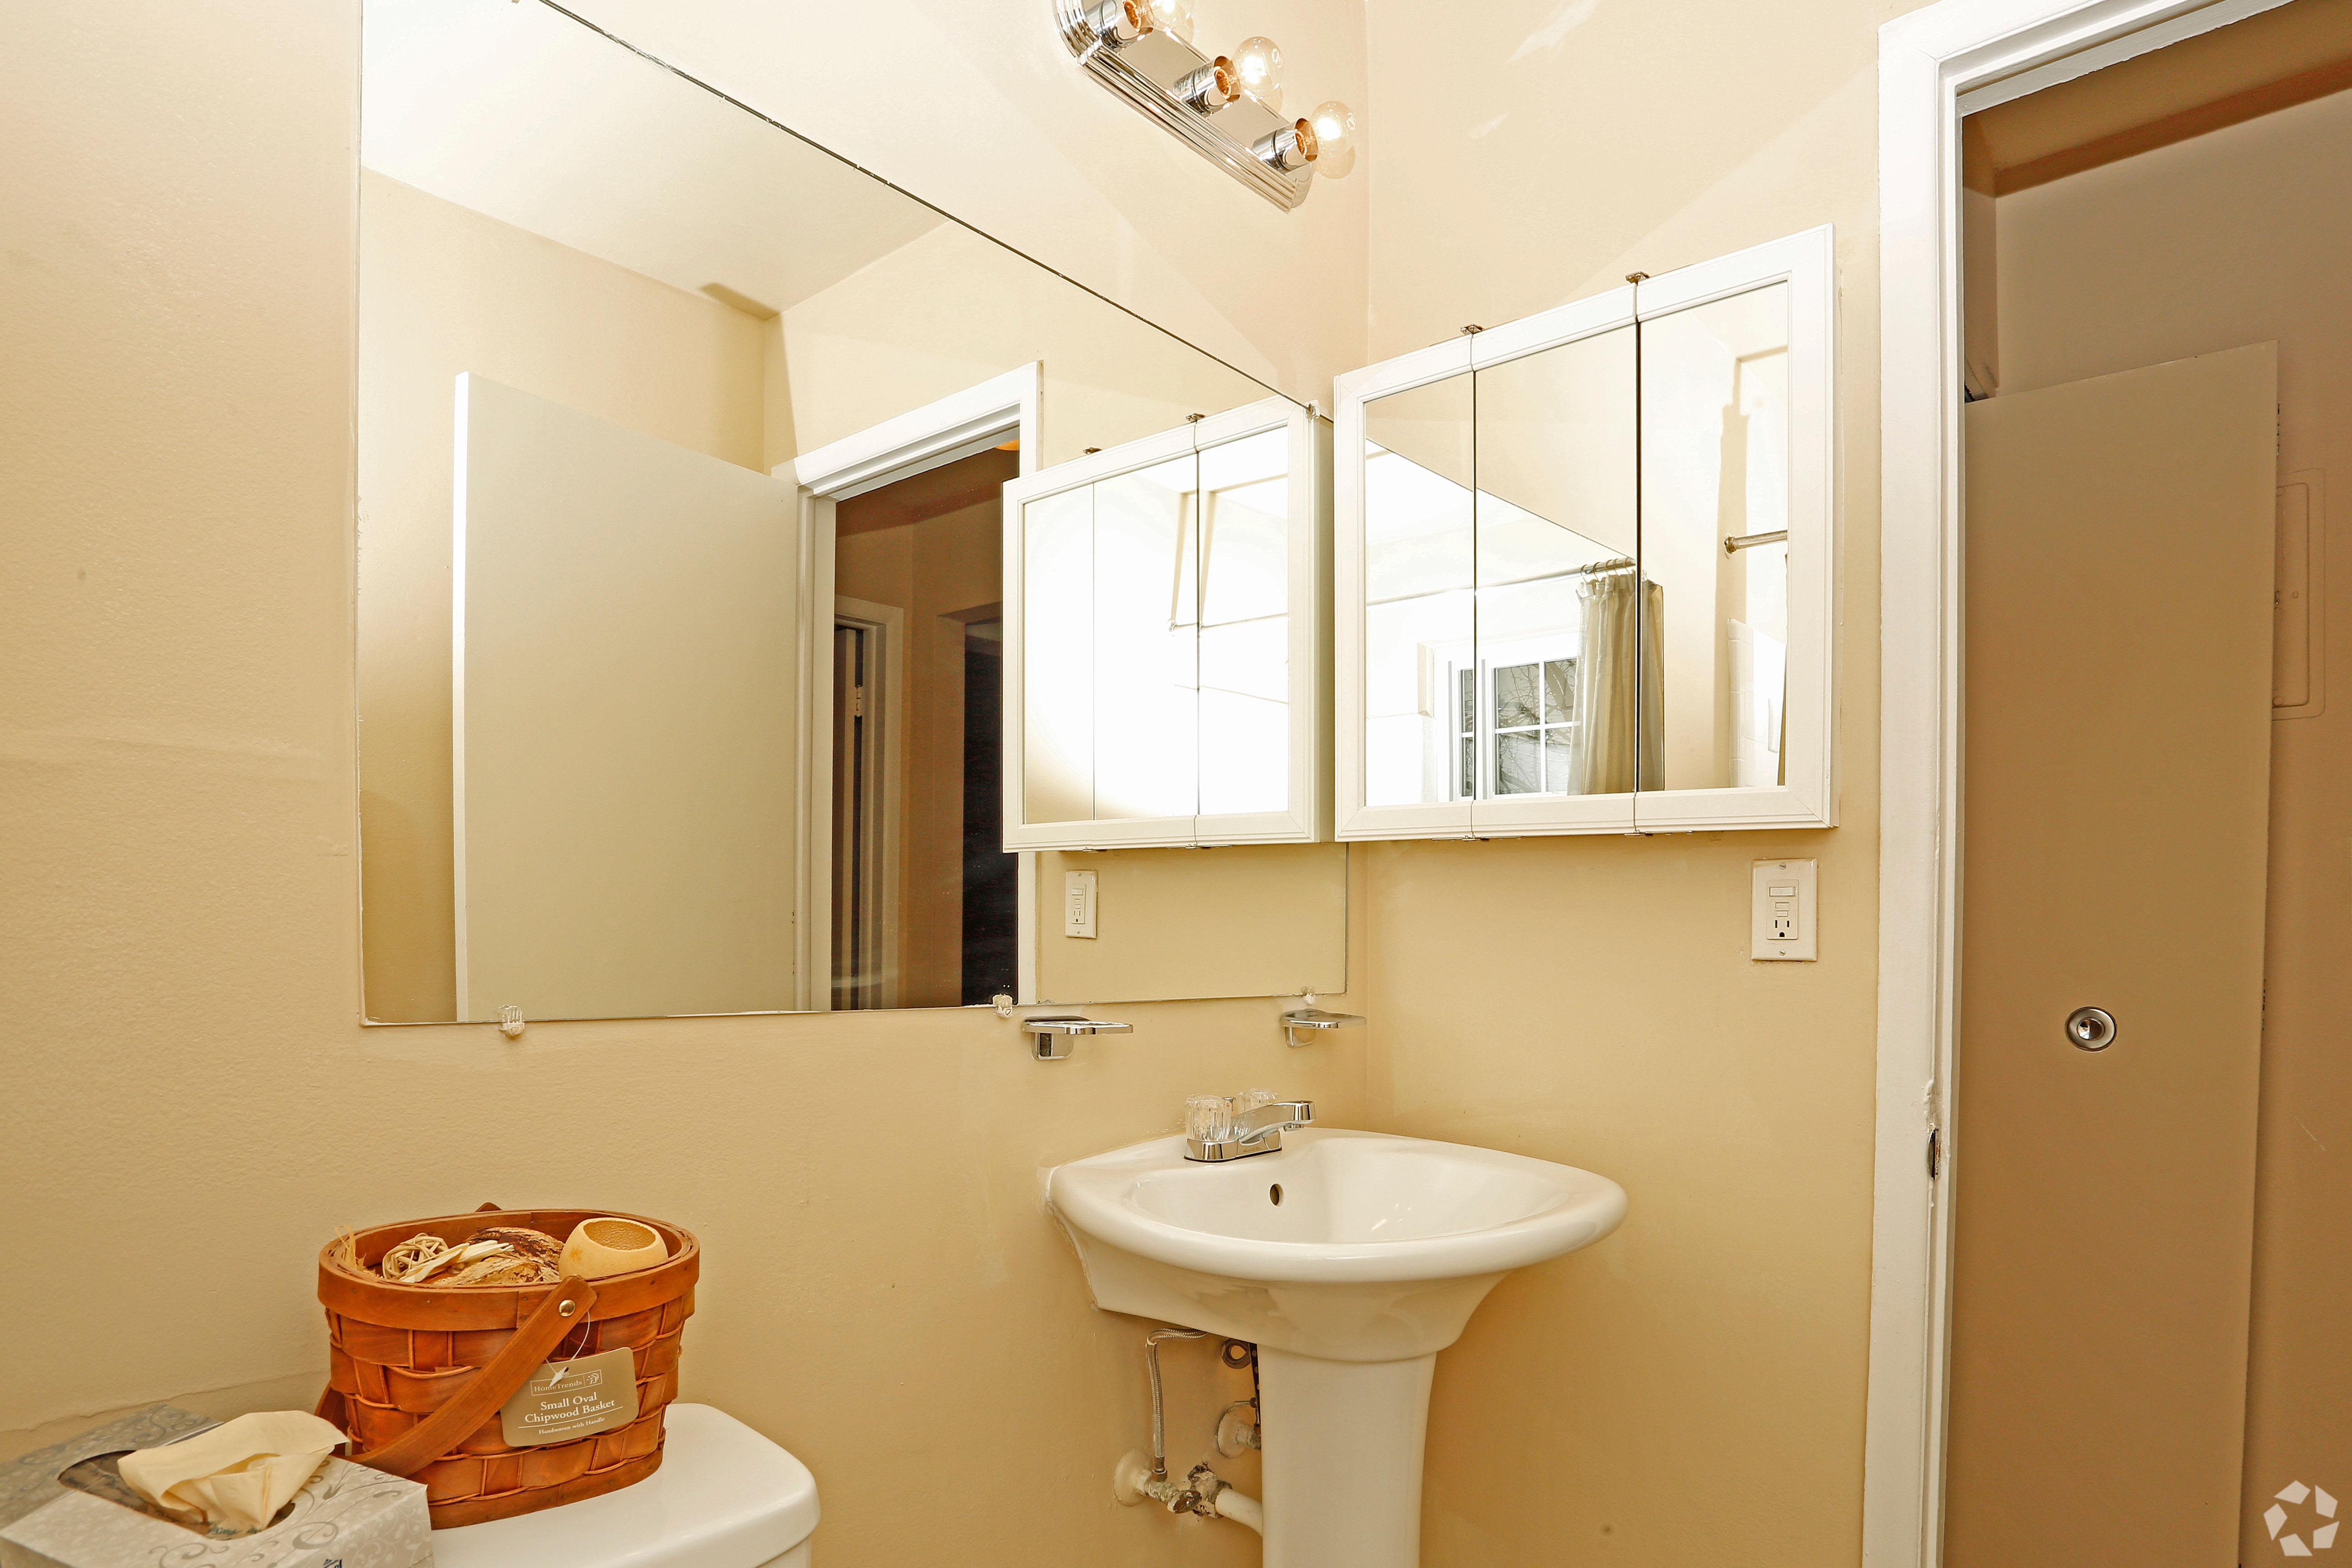 Our unique Hoover Square Apartments apartments in Warren, Michigan showcase a bathroom